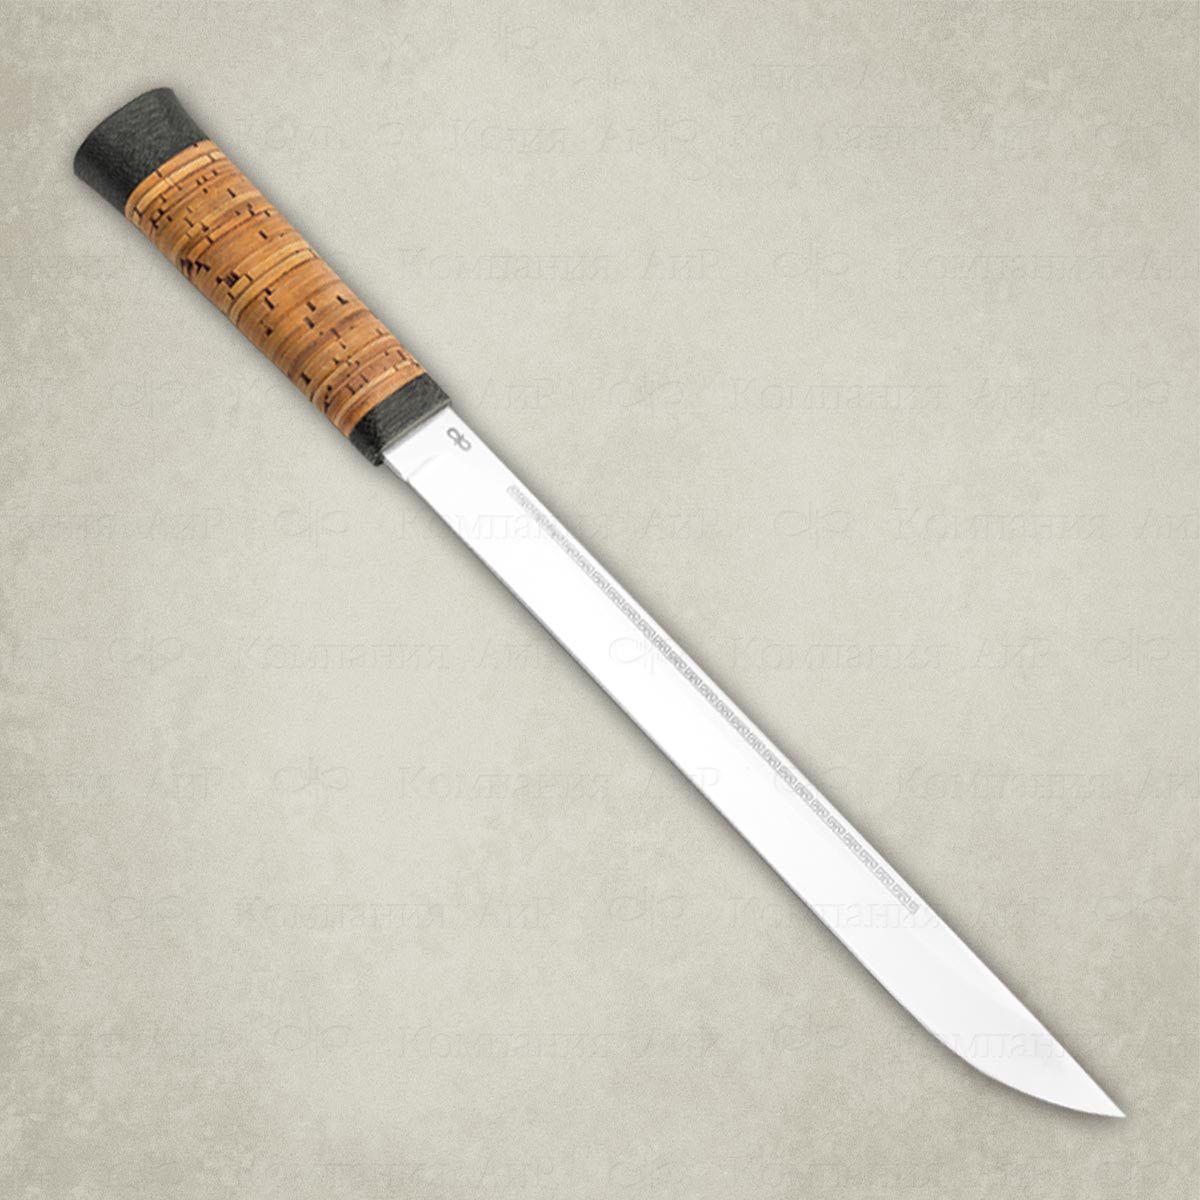 Нож АиР Бурятский большой, сталь 95х18, рукоять береста